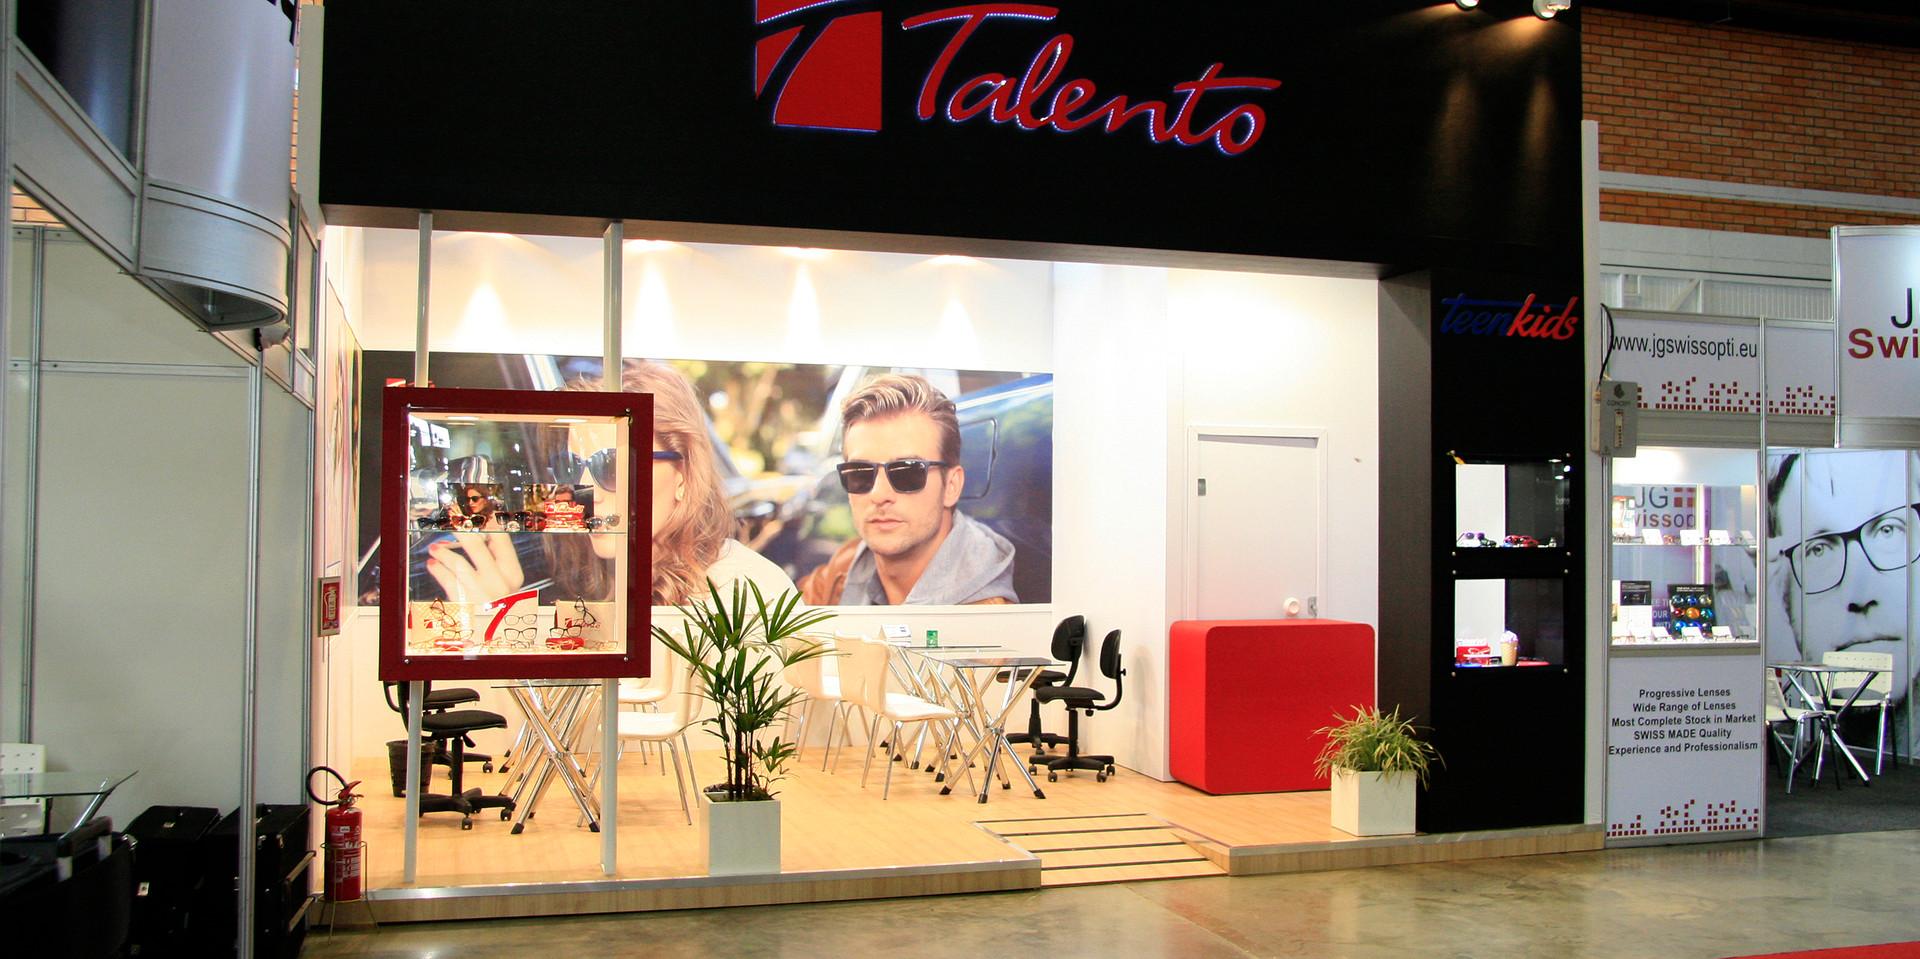 Talento (4).JPG